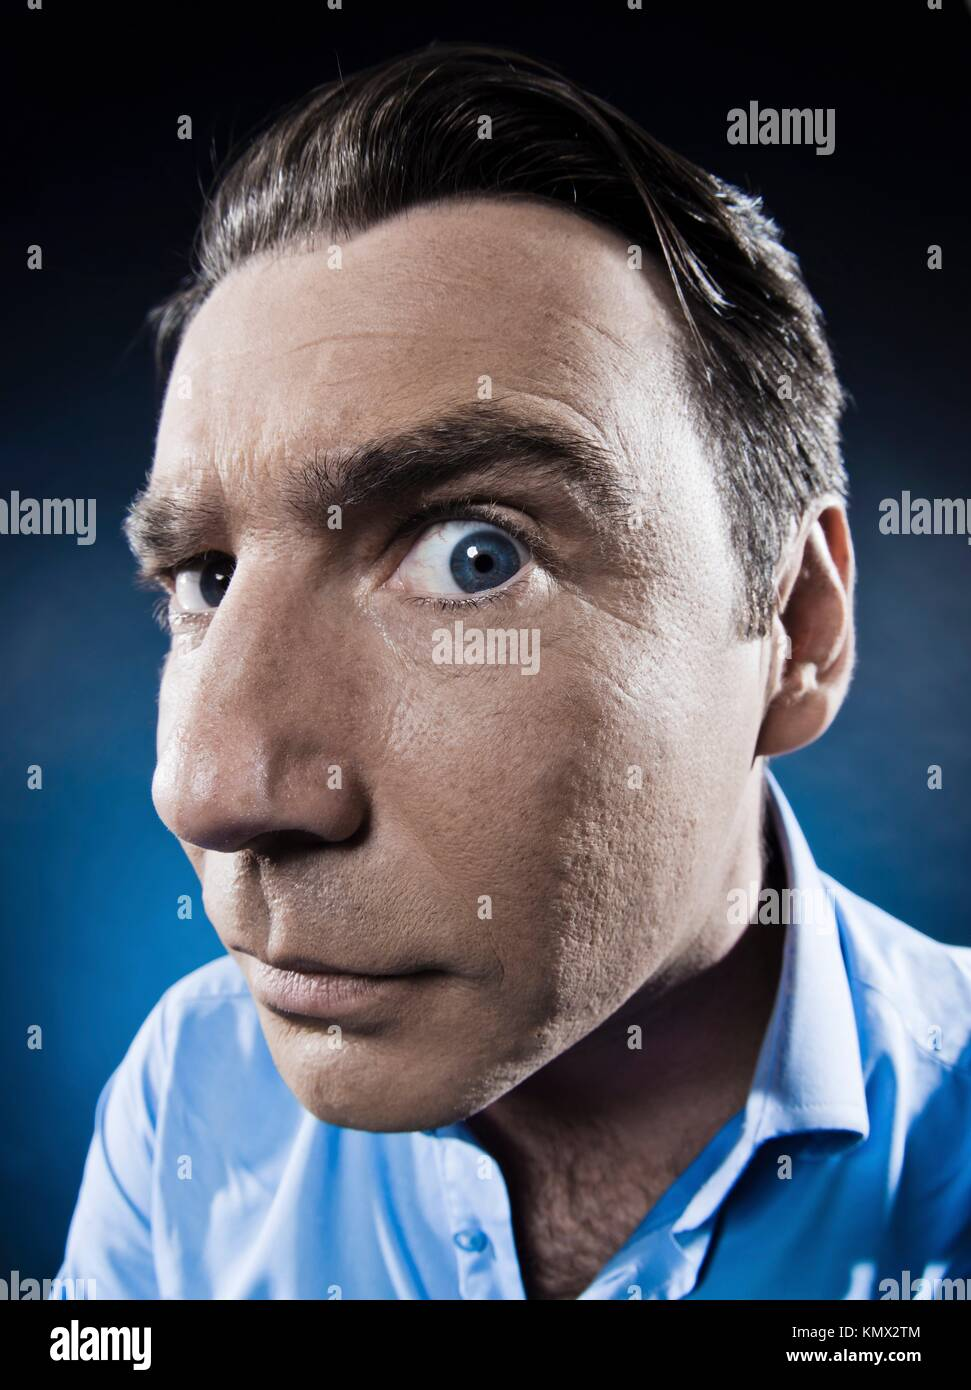 caucasian man observe suspicious portrait isolated studio on black background - Stock Image